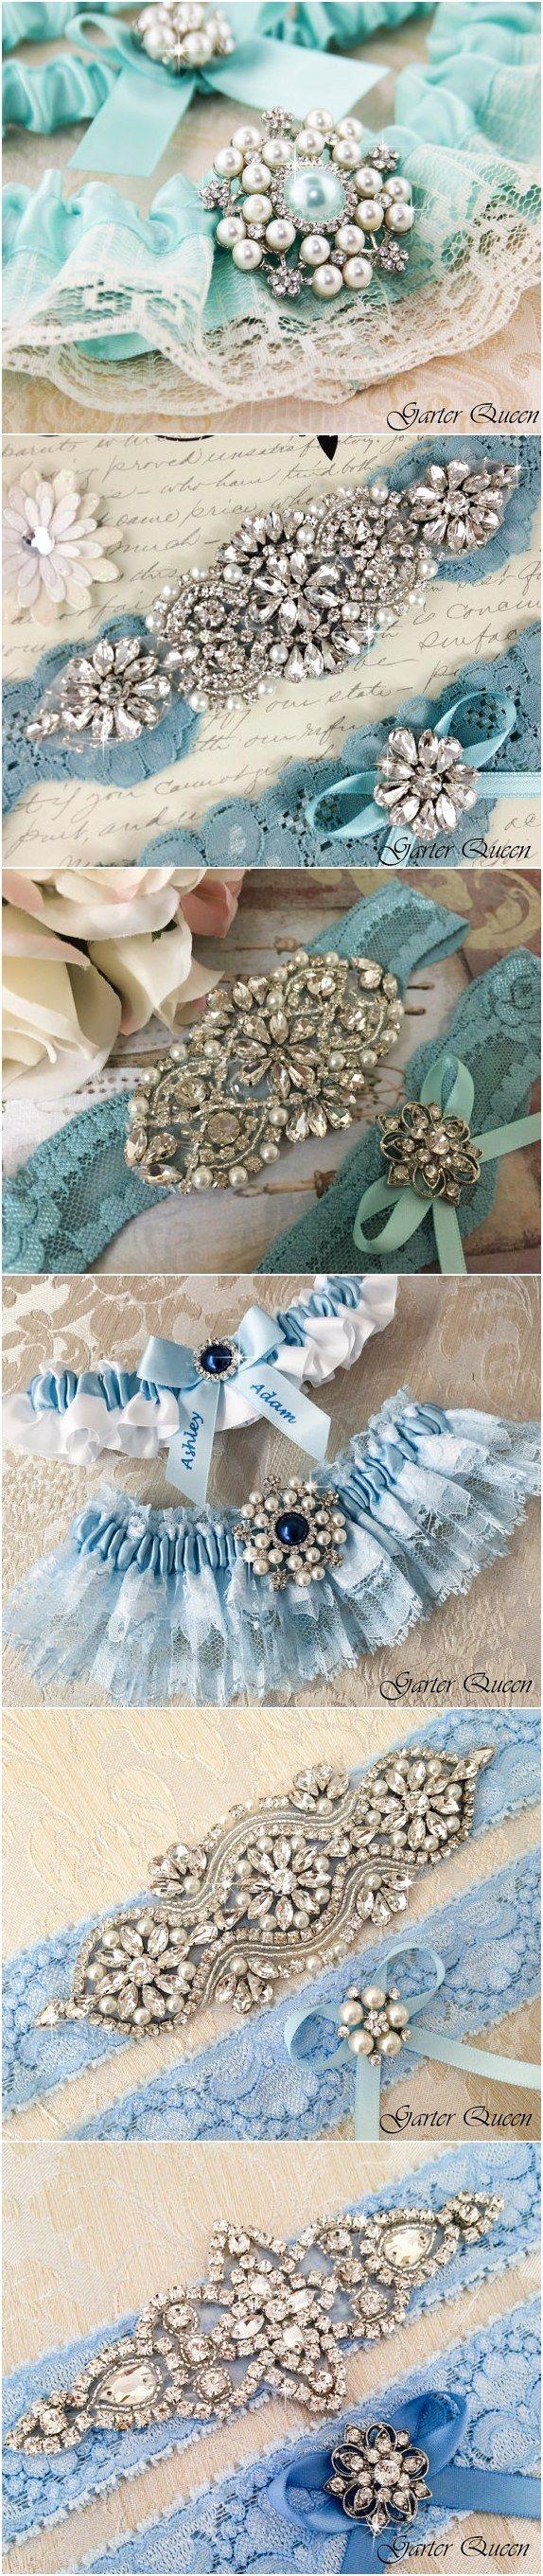 Vintage Blue lace wedding garter sets / http://www.deerpearlflowers.com/wedding-garters-sets-from-etsy/3/